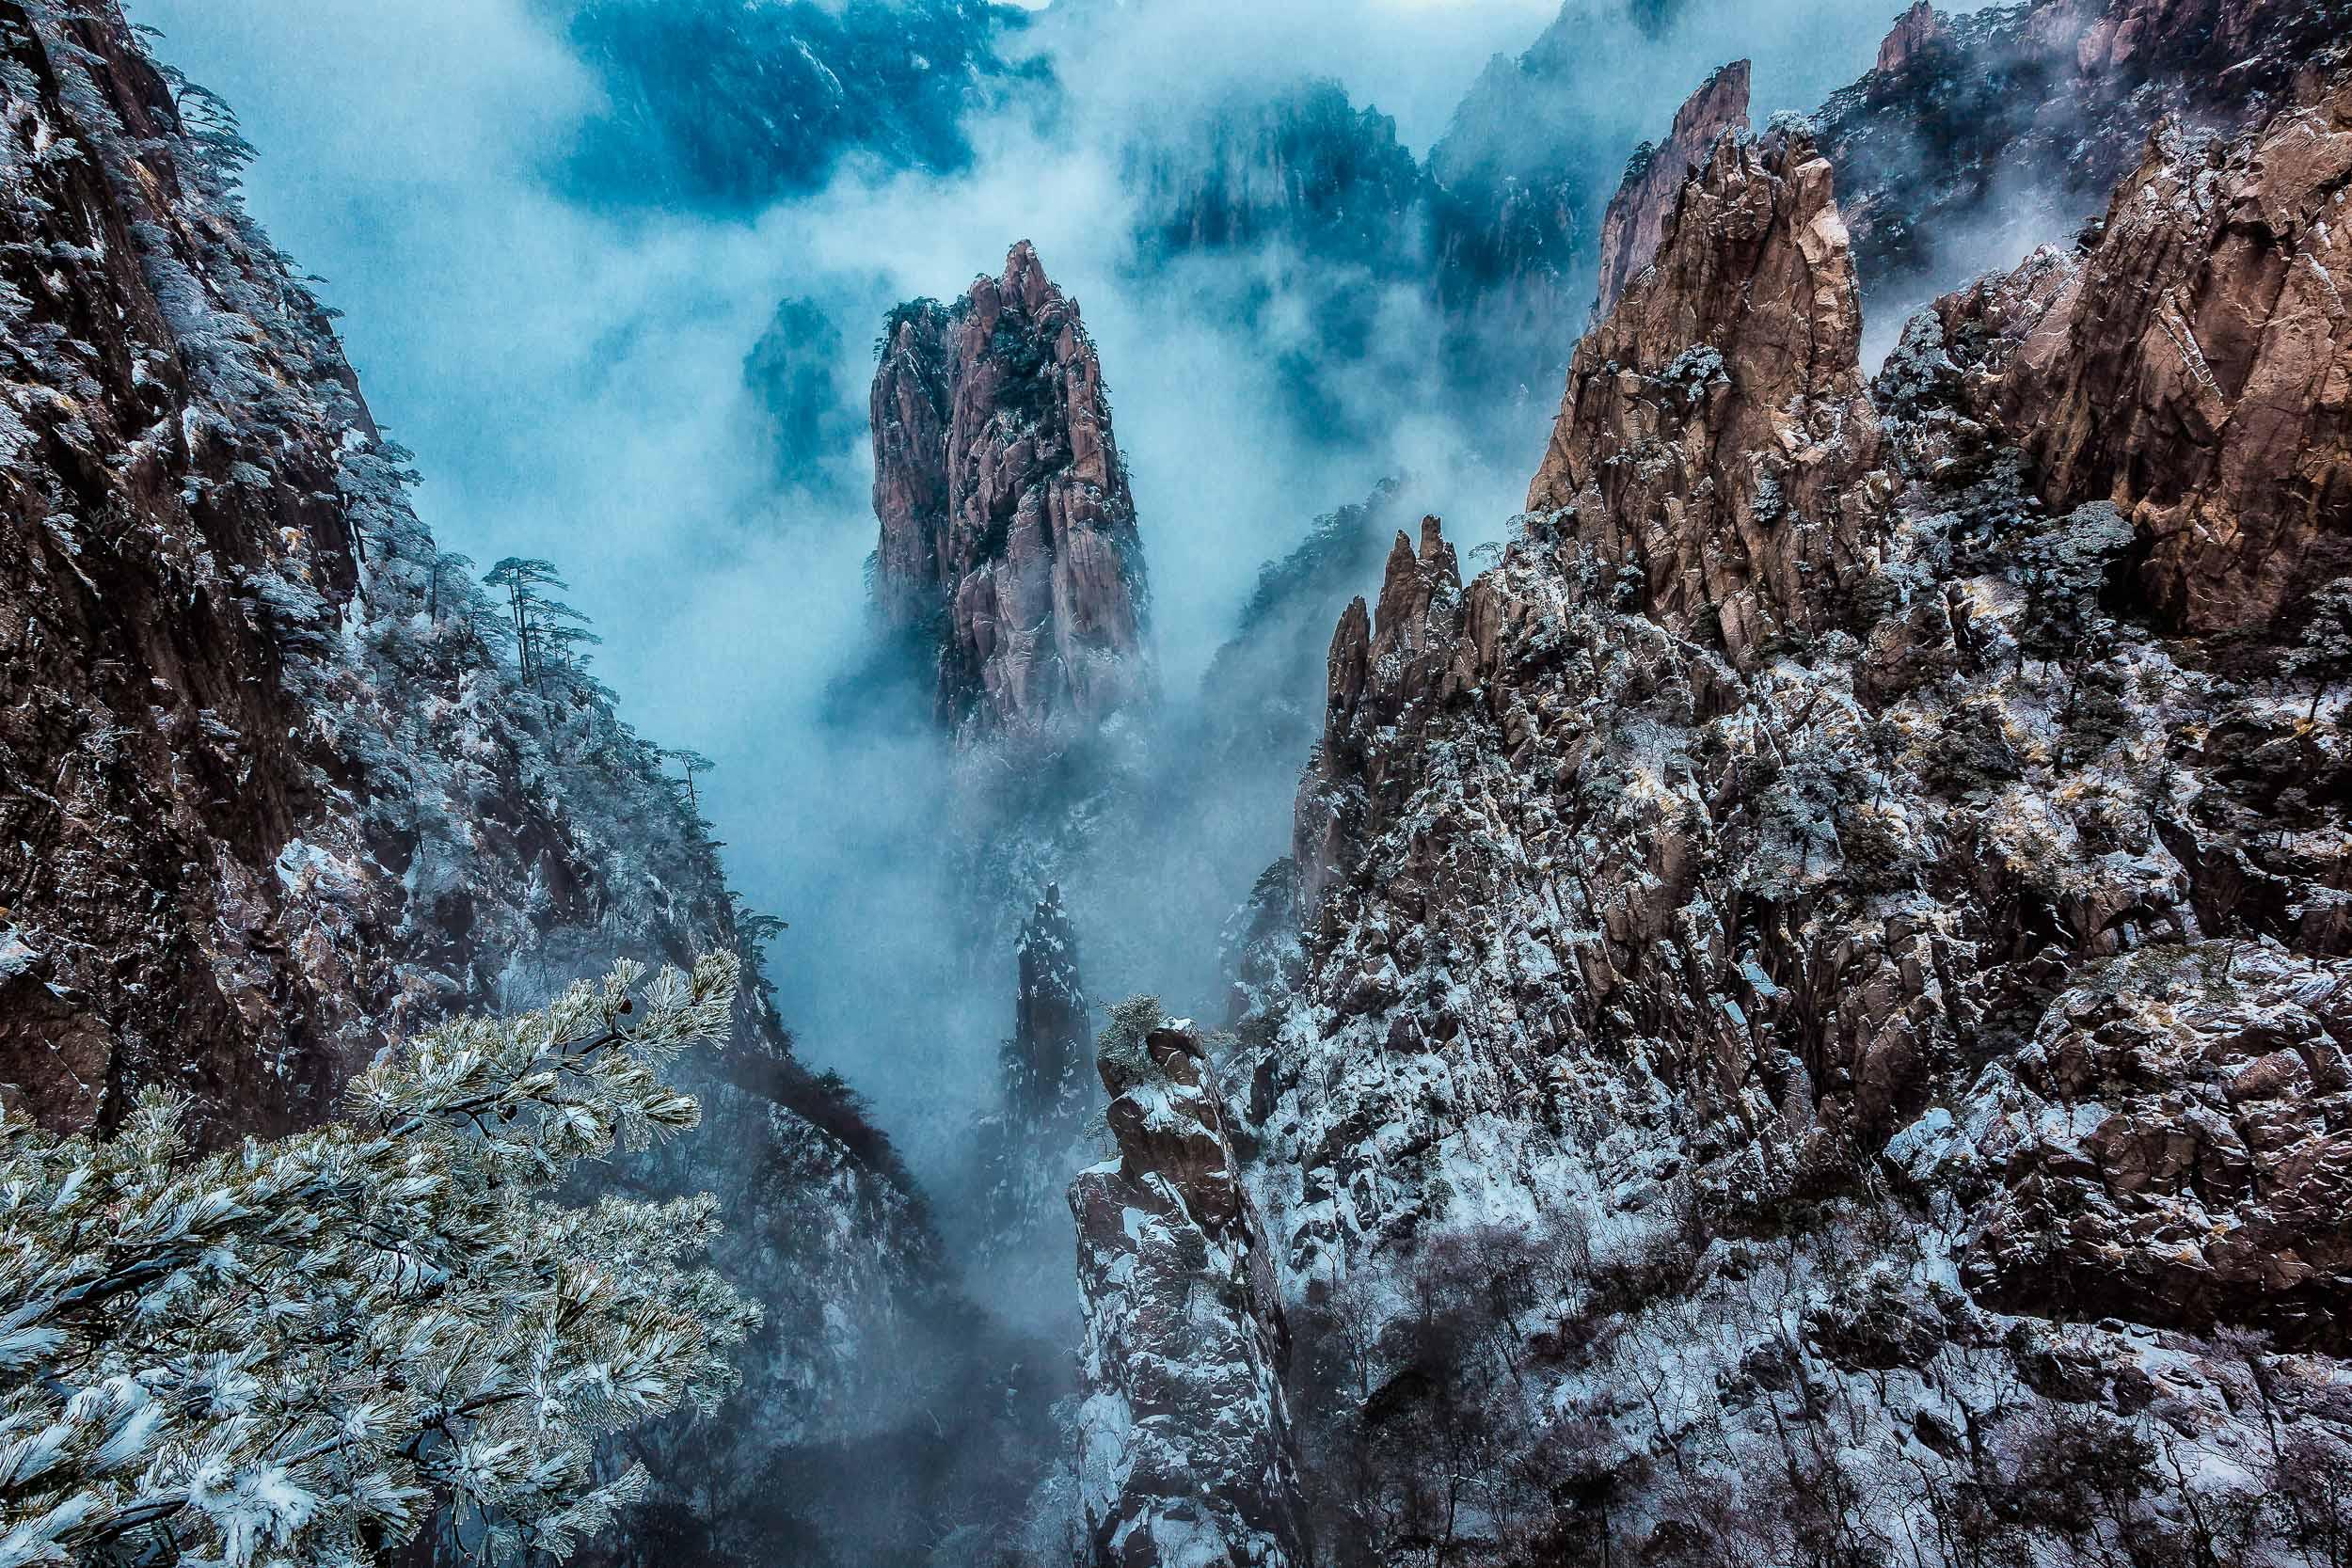 Mist swirling around peaks of stone on    Huangshan    (i.e., Yellow Mountain),    China   .